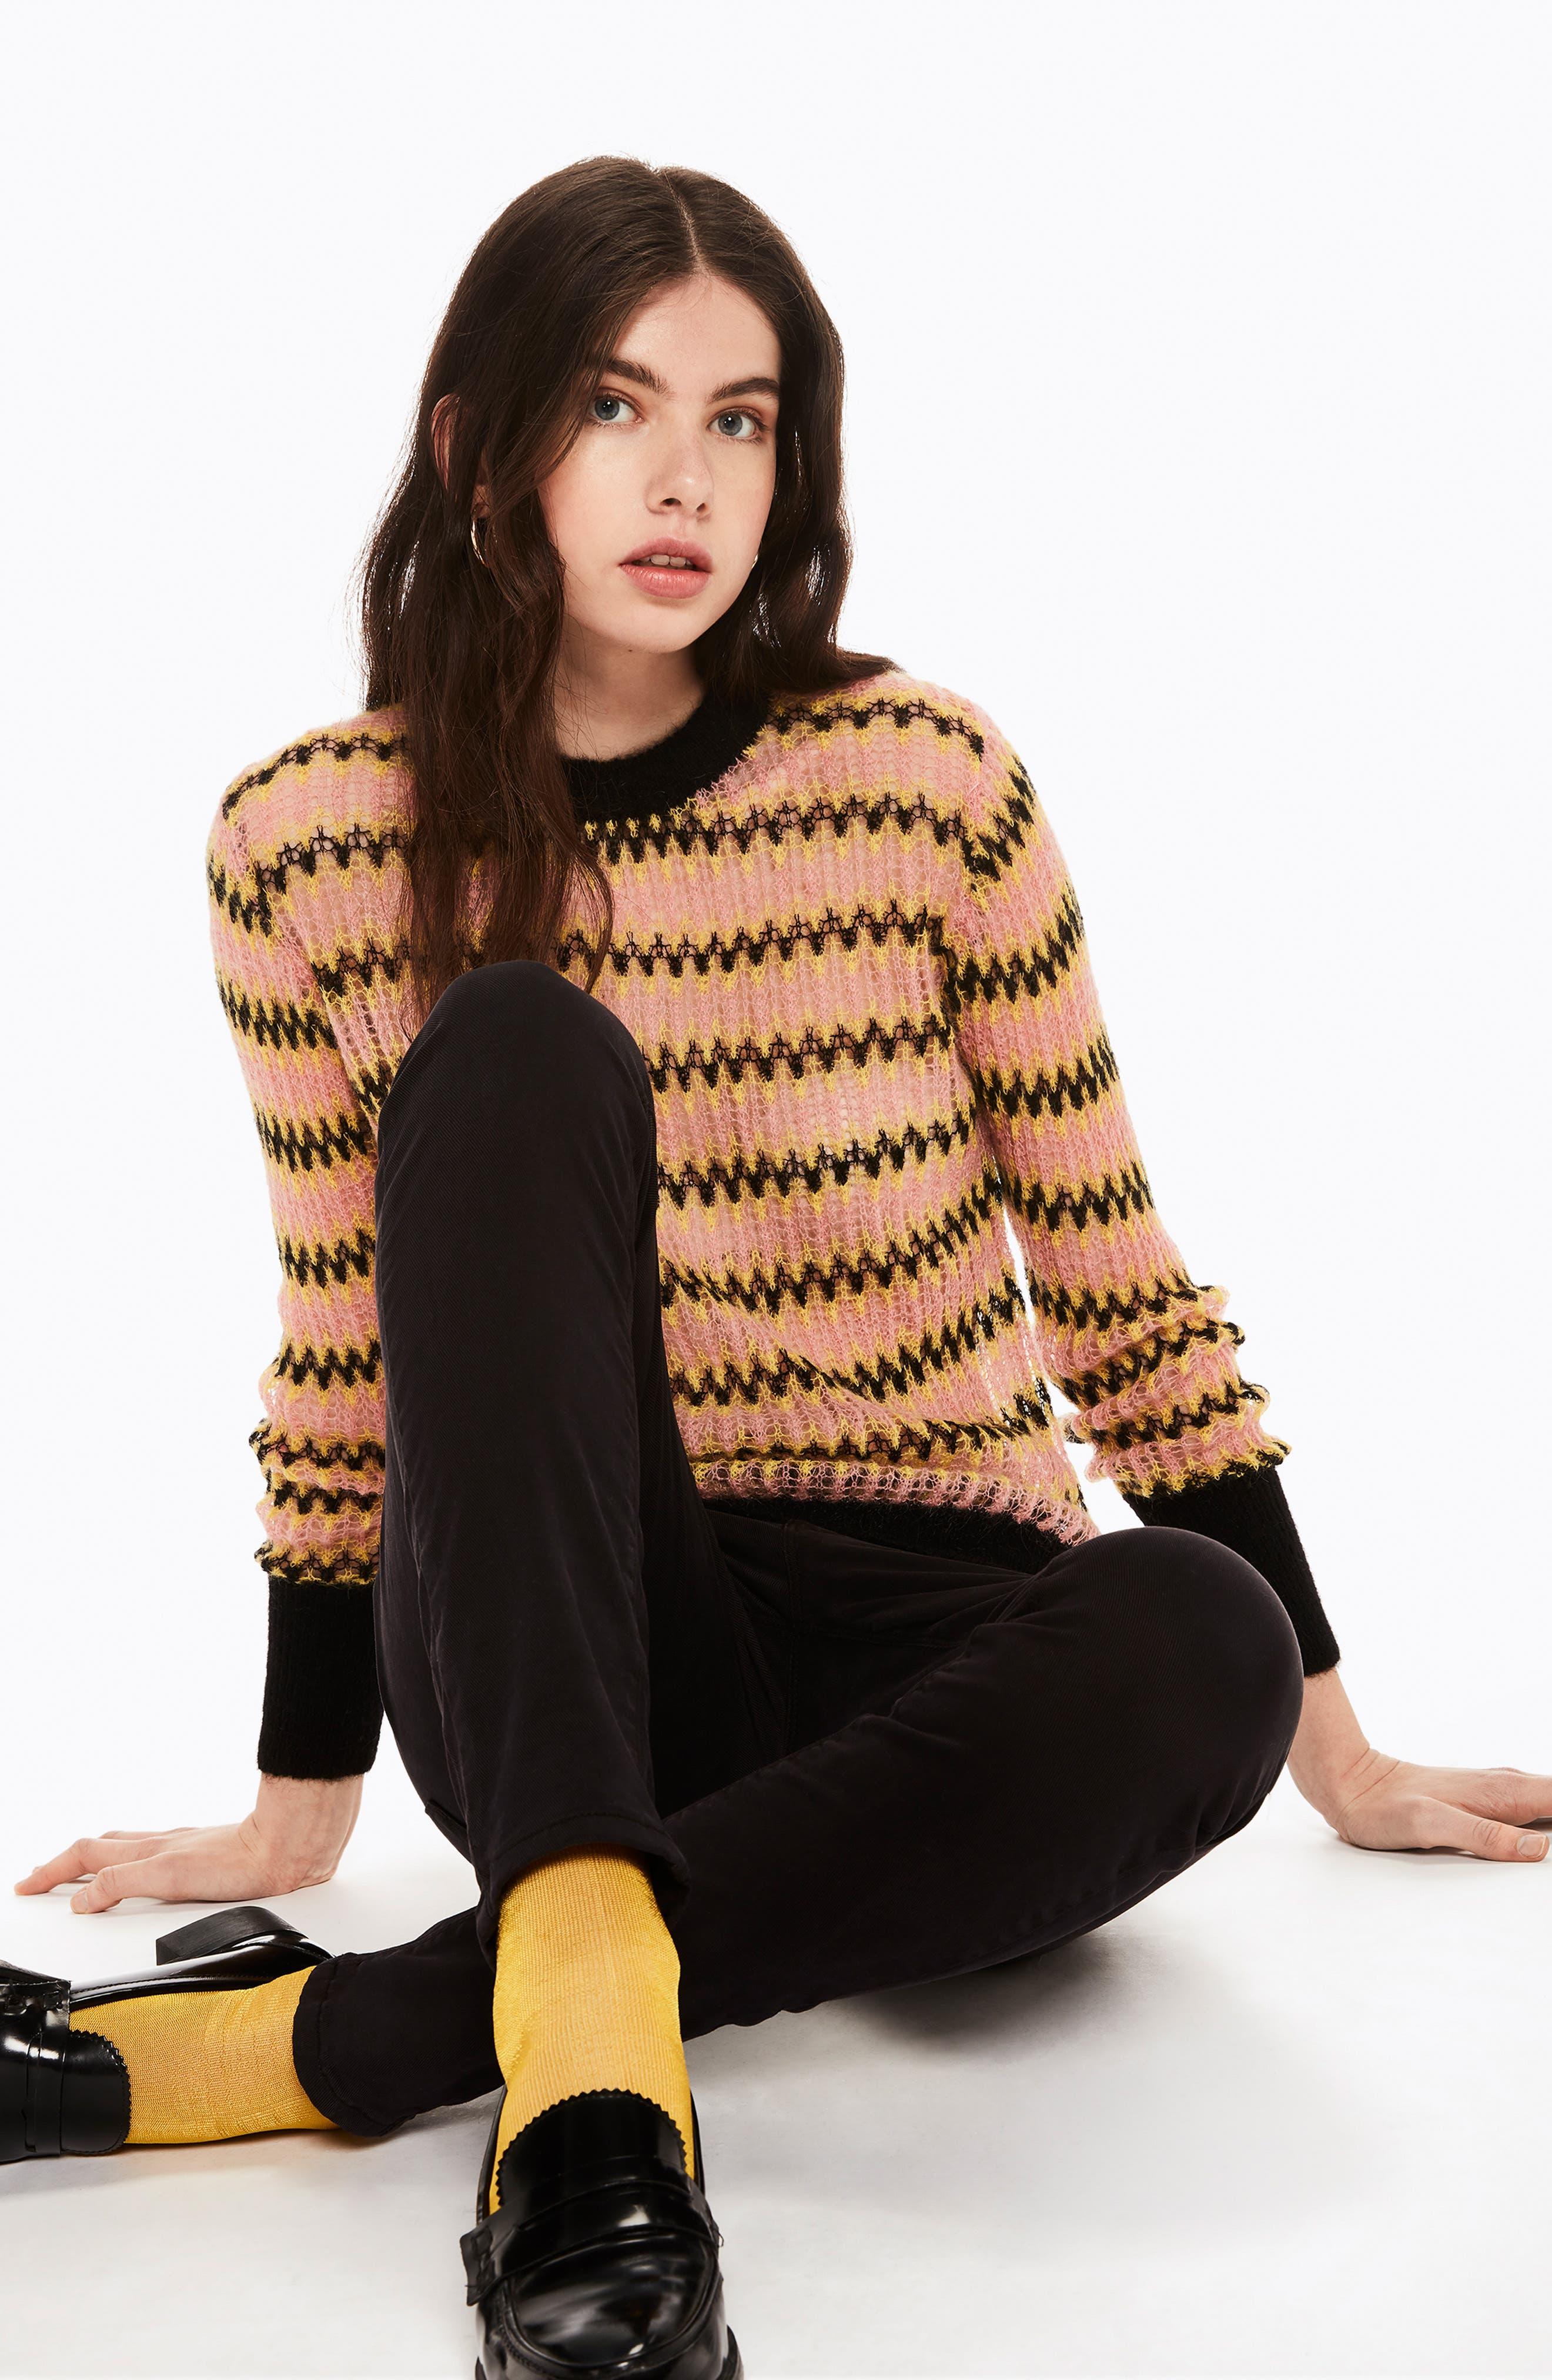 Zig Zag Wool Blend Sweater,                             Alternate thumbnail 8, color,                             MULTI PINK YELLOW ZIGZAG PRINT